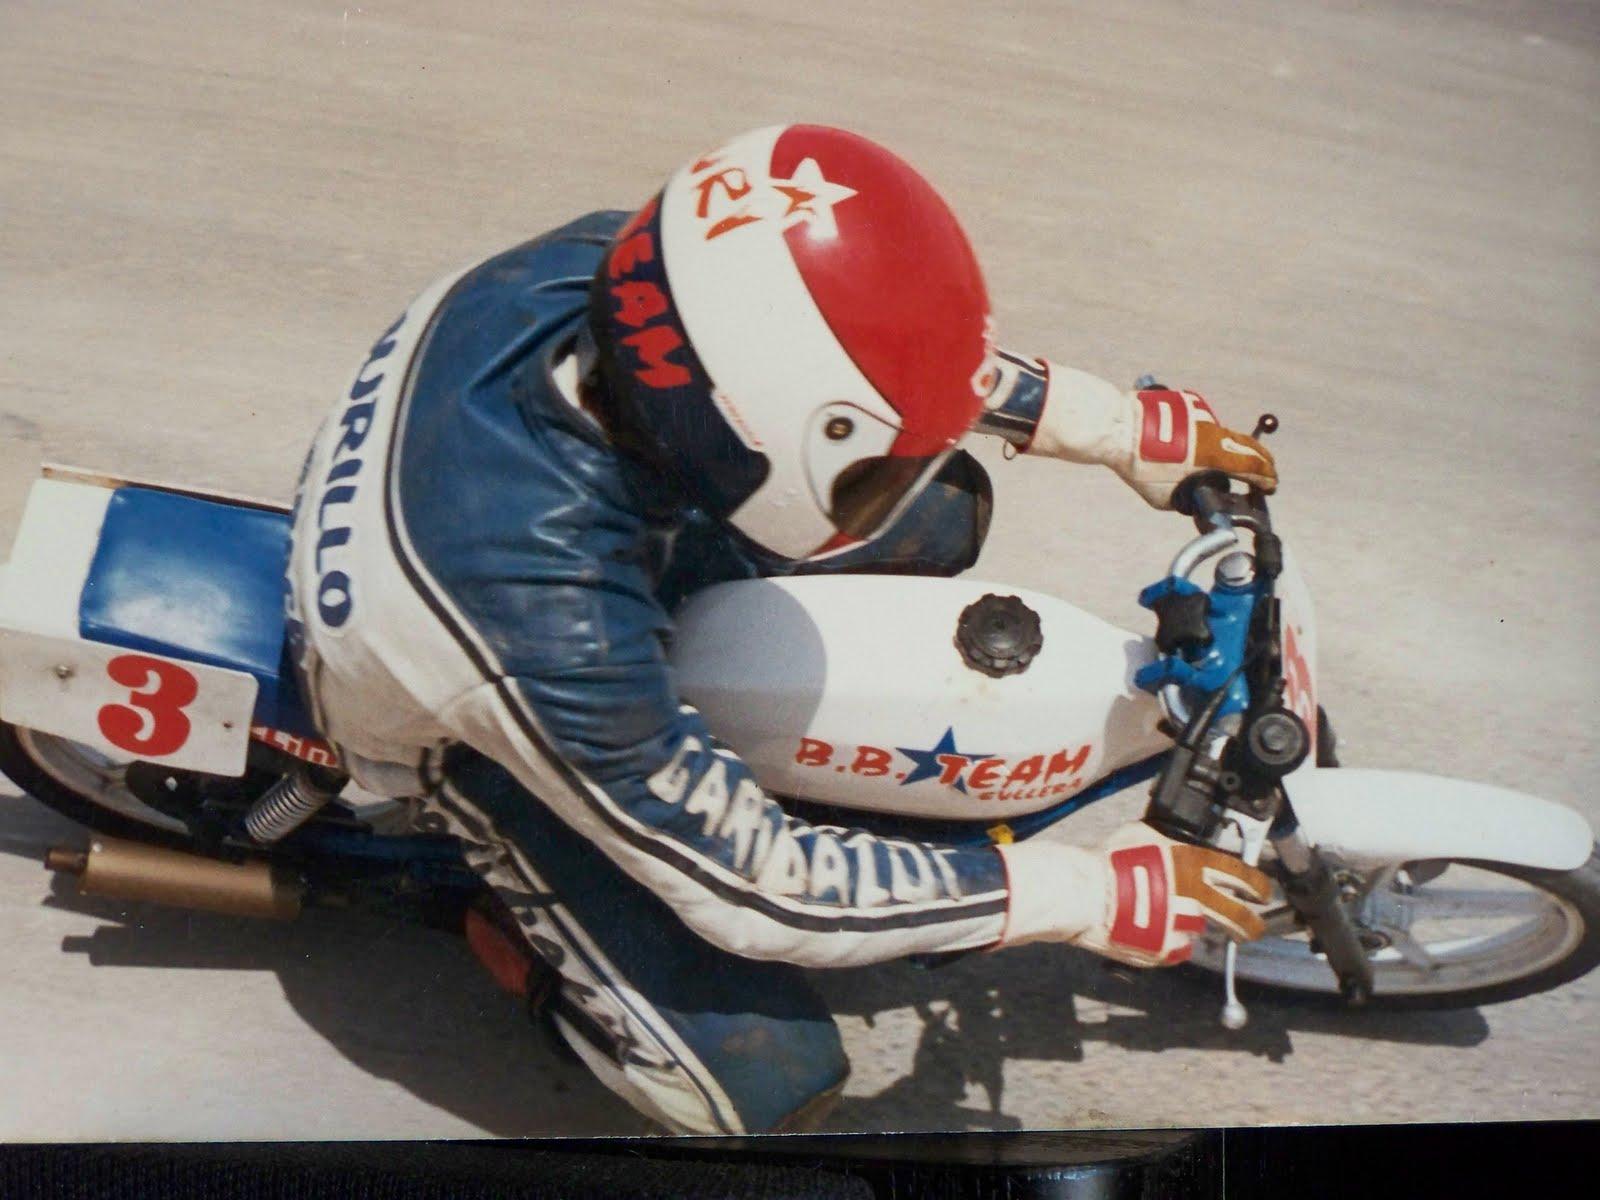 Bultaco Streaker de Jesus Murillo 101_1968